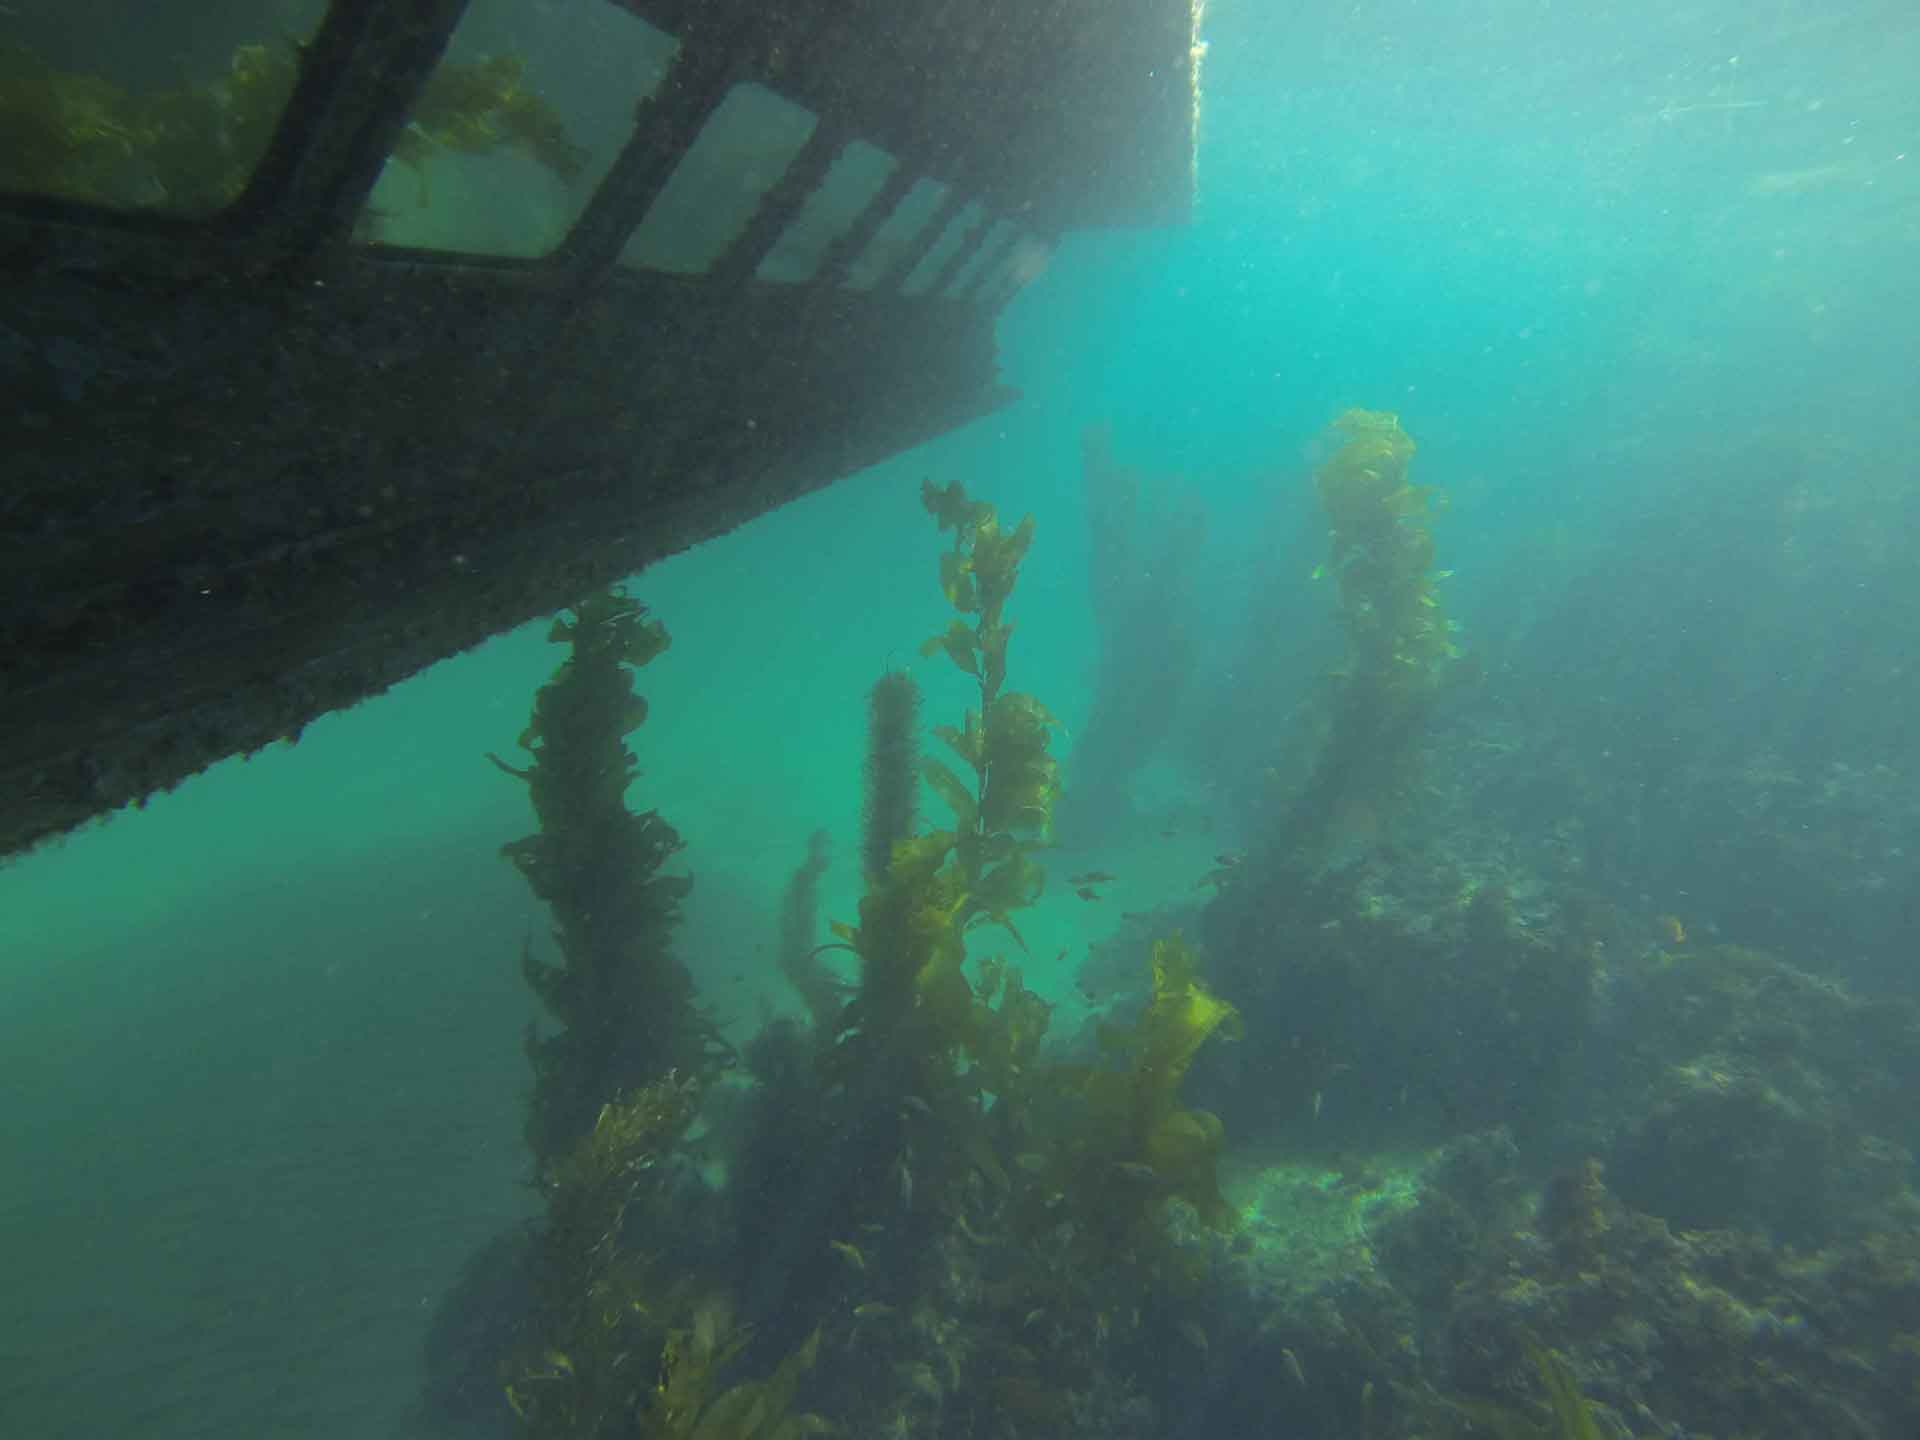 Underwater Windows Provide Unique Perspective